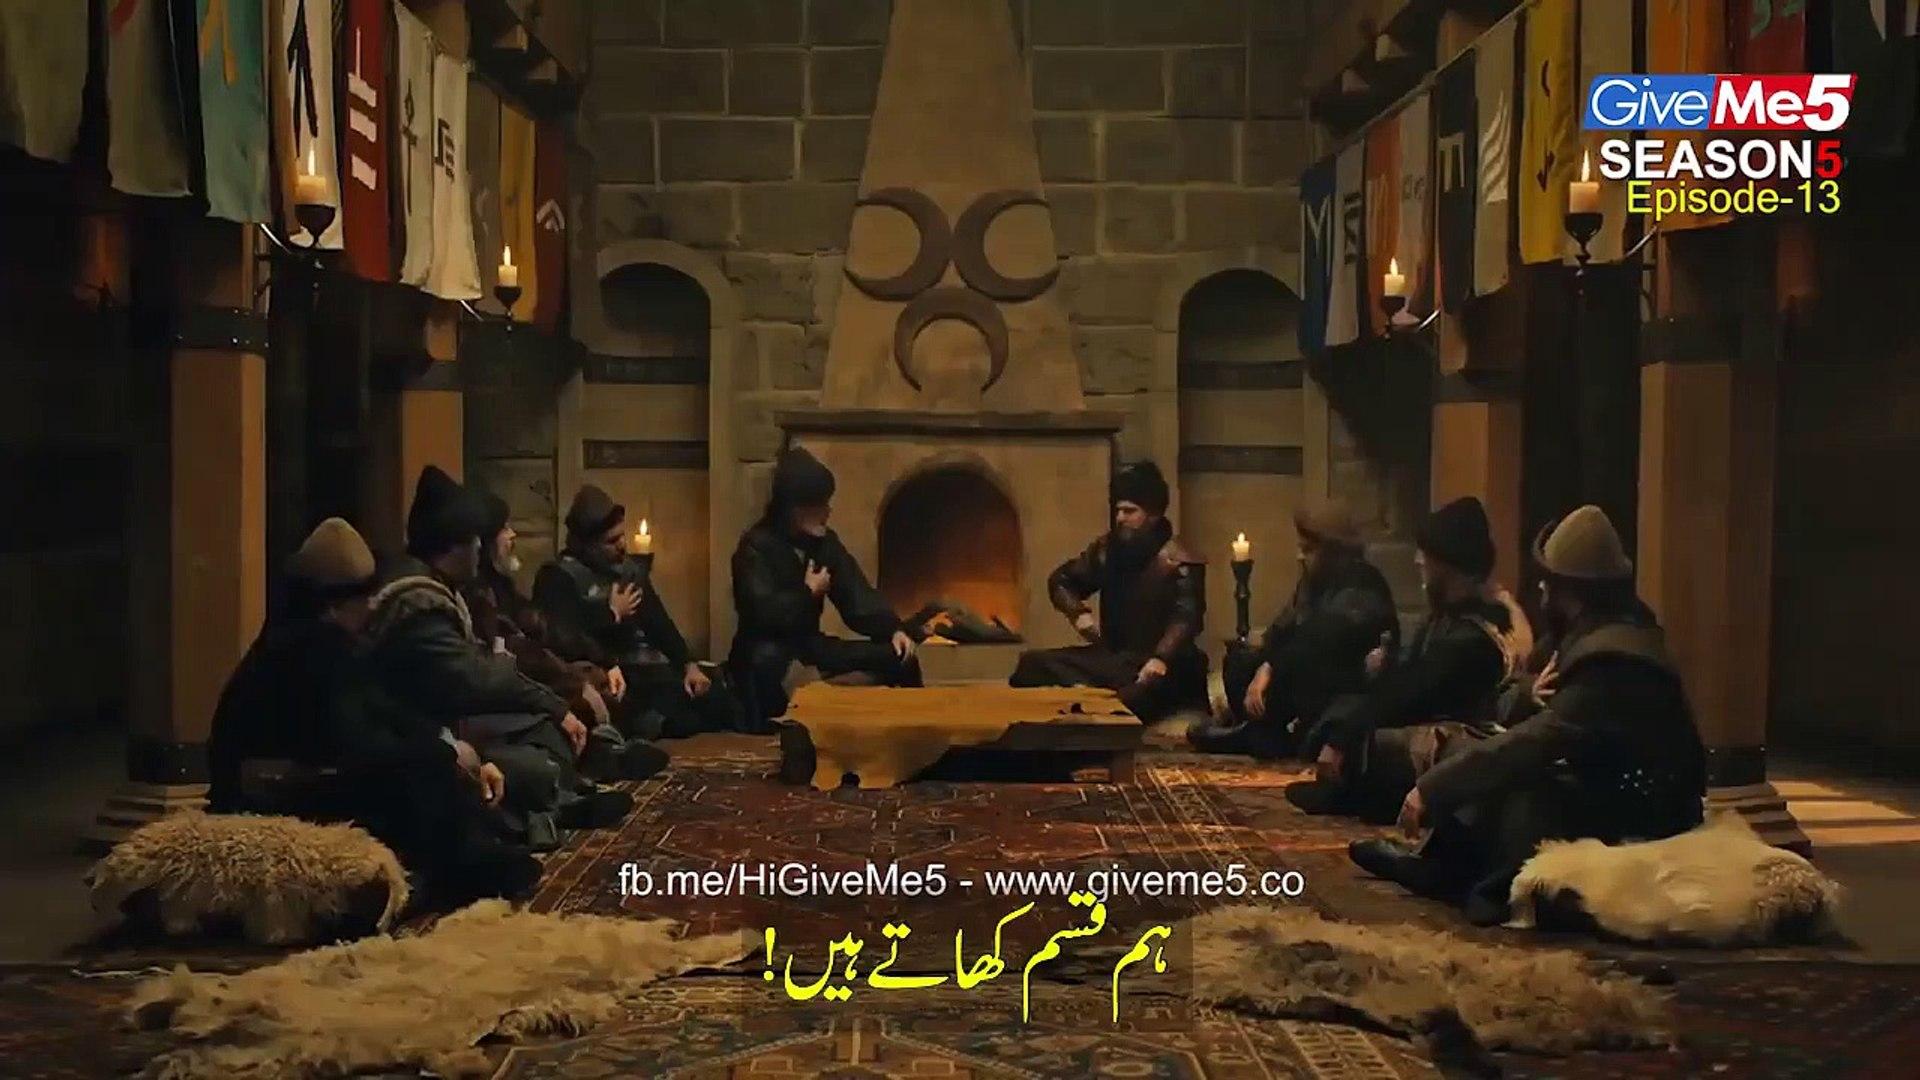 Dirilis Ertugrul Ghazi Season 5 in Urdu Subtitle Episode 13 & 14